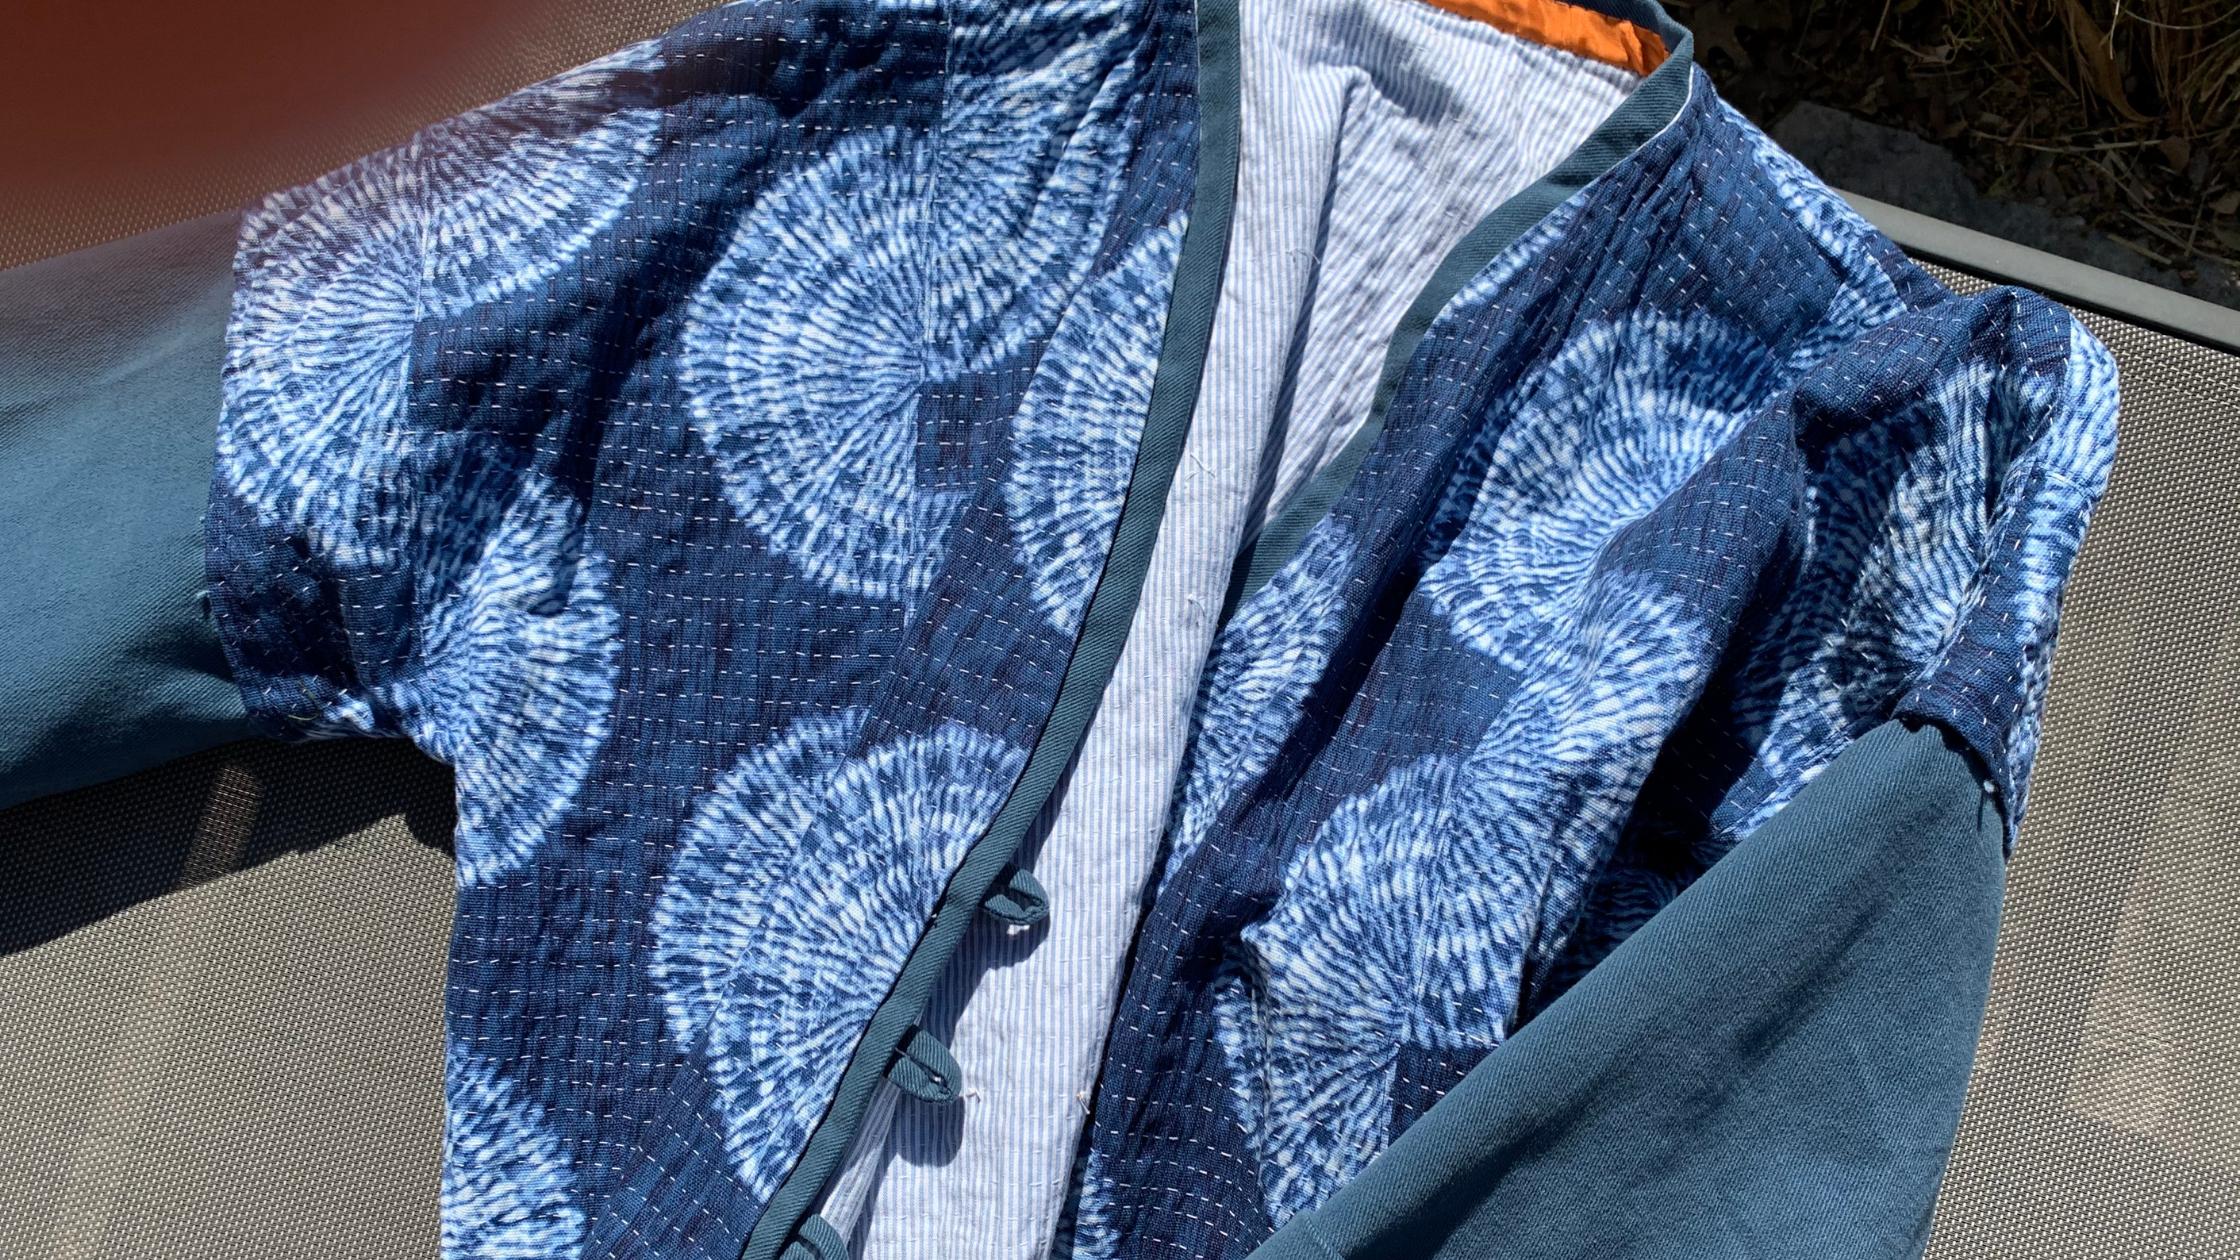 Susan's gorgeous hand-made hand-dyed Shibori jacket!